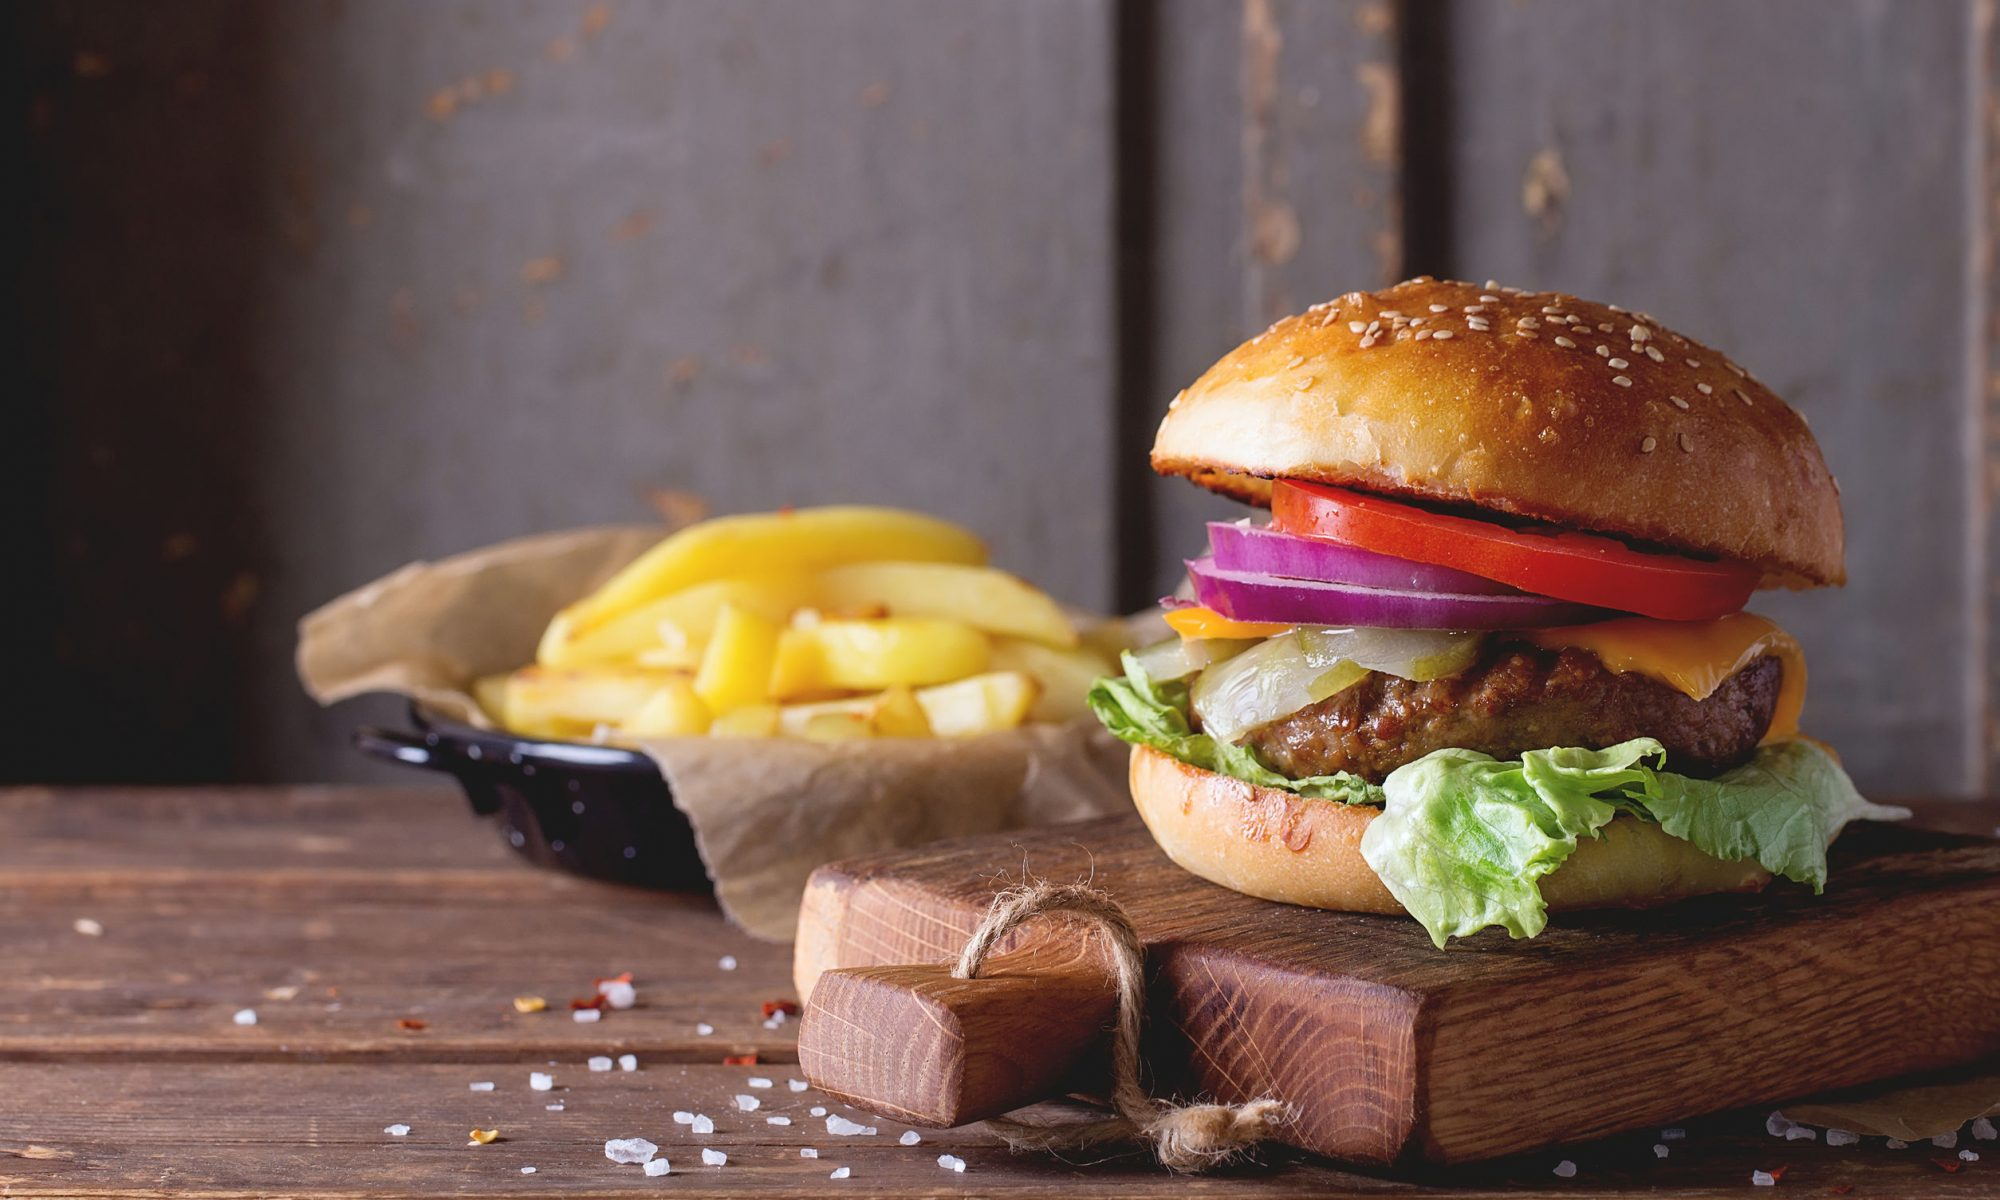 Гамбургер: рецепт, который не принесет вреда